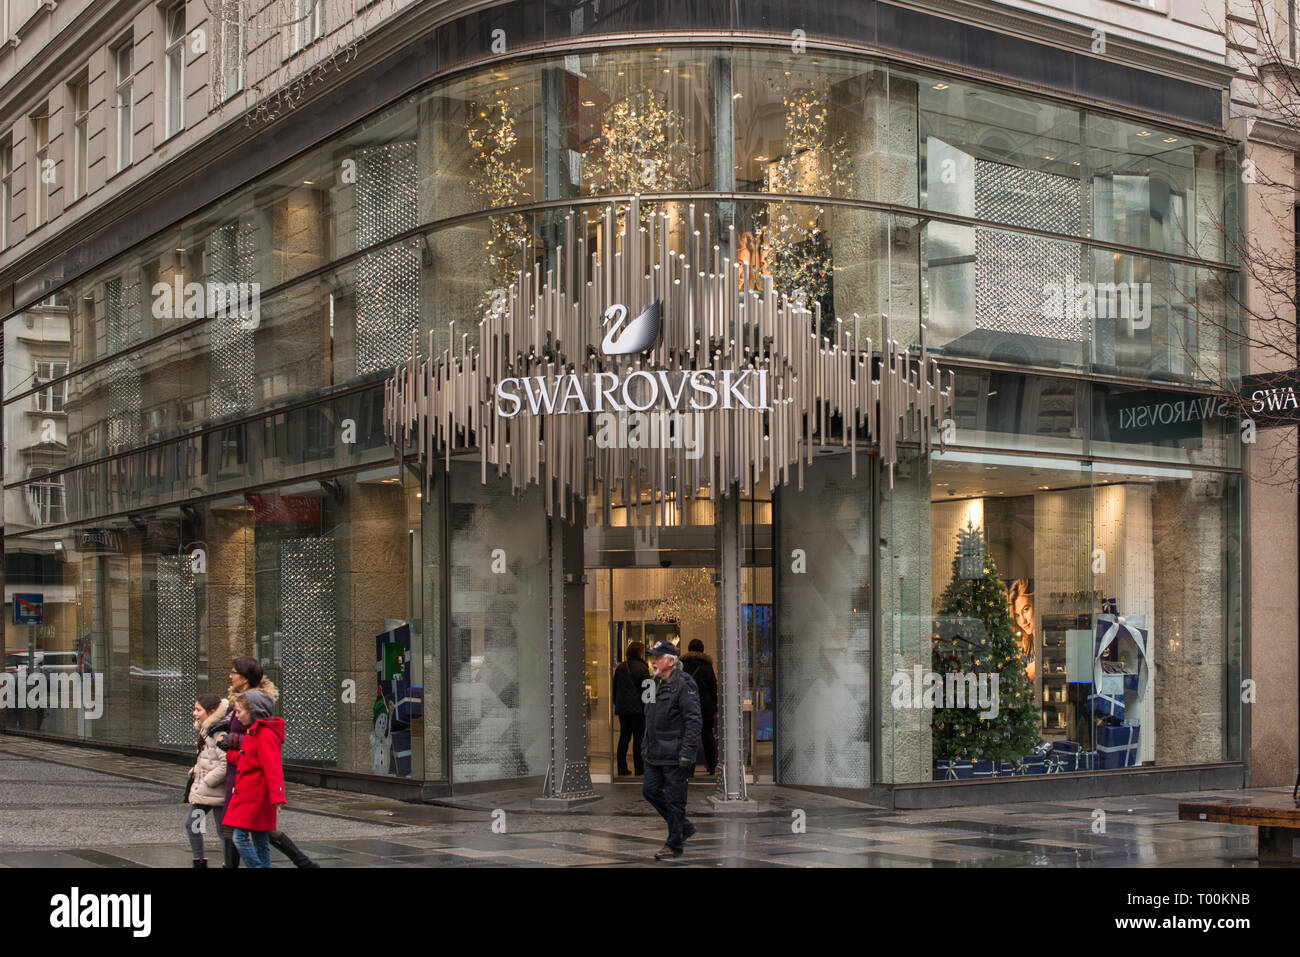 277d47fd5a5 Swarovski jewelry shop on Kartner street in Vienna, Austria. - Stock Image